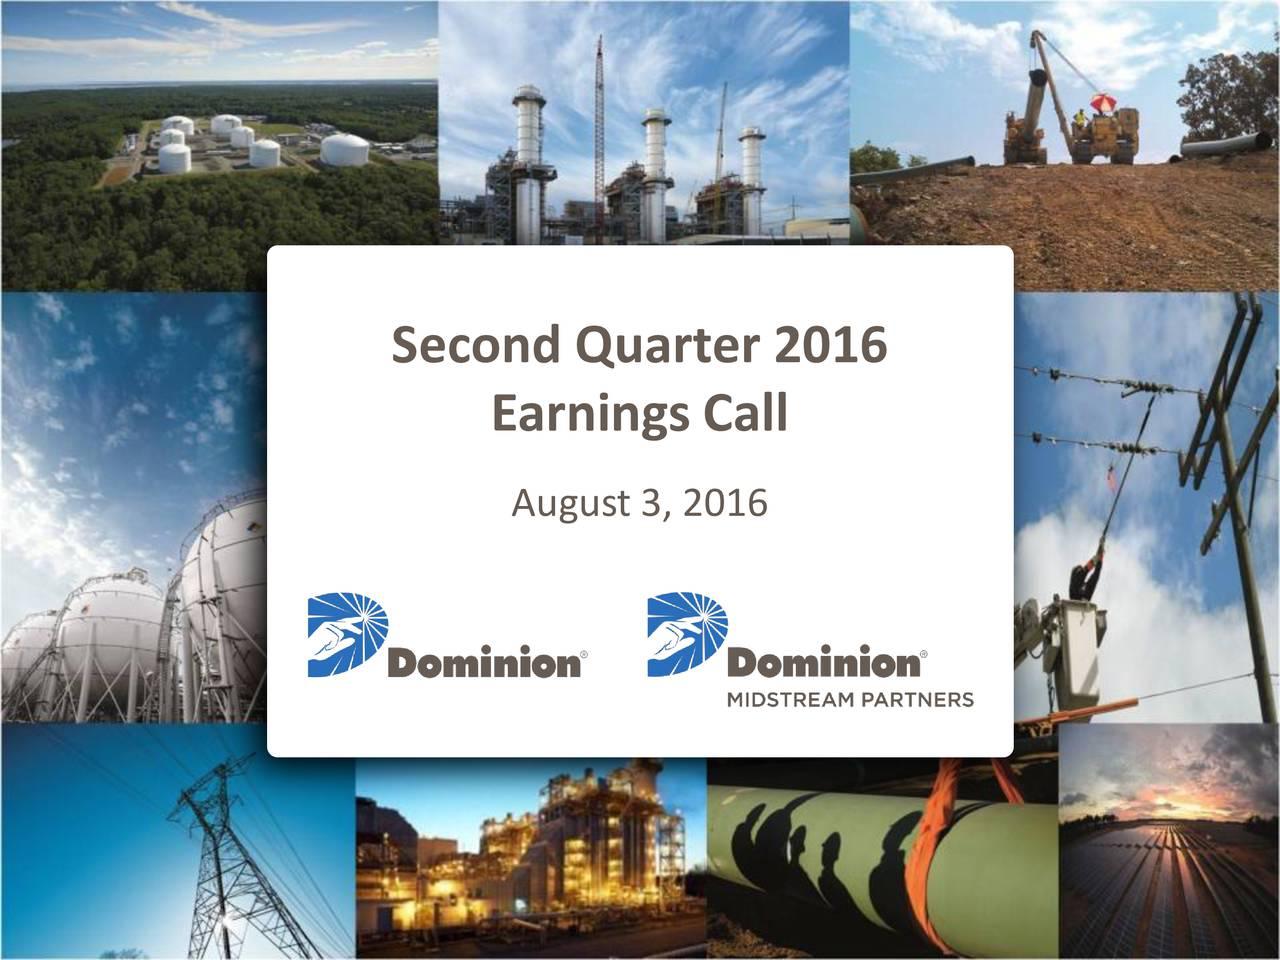 Earnings Call August 3, 2016